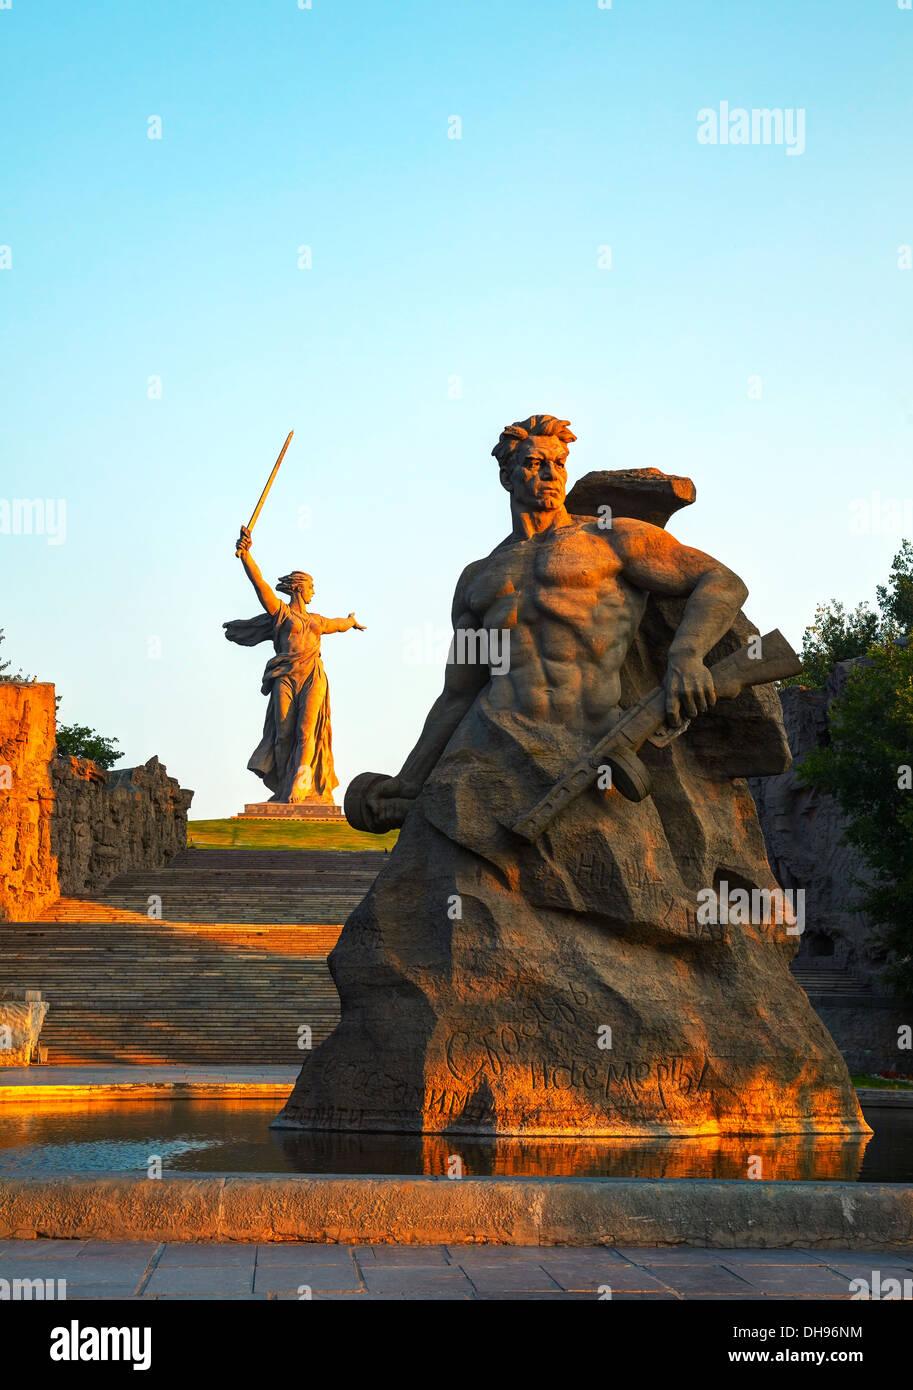 """Der Heimat ruft!""-Denkmal in Wolgograd, Russland. Stockfoto"